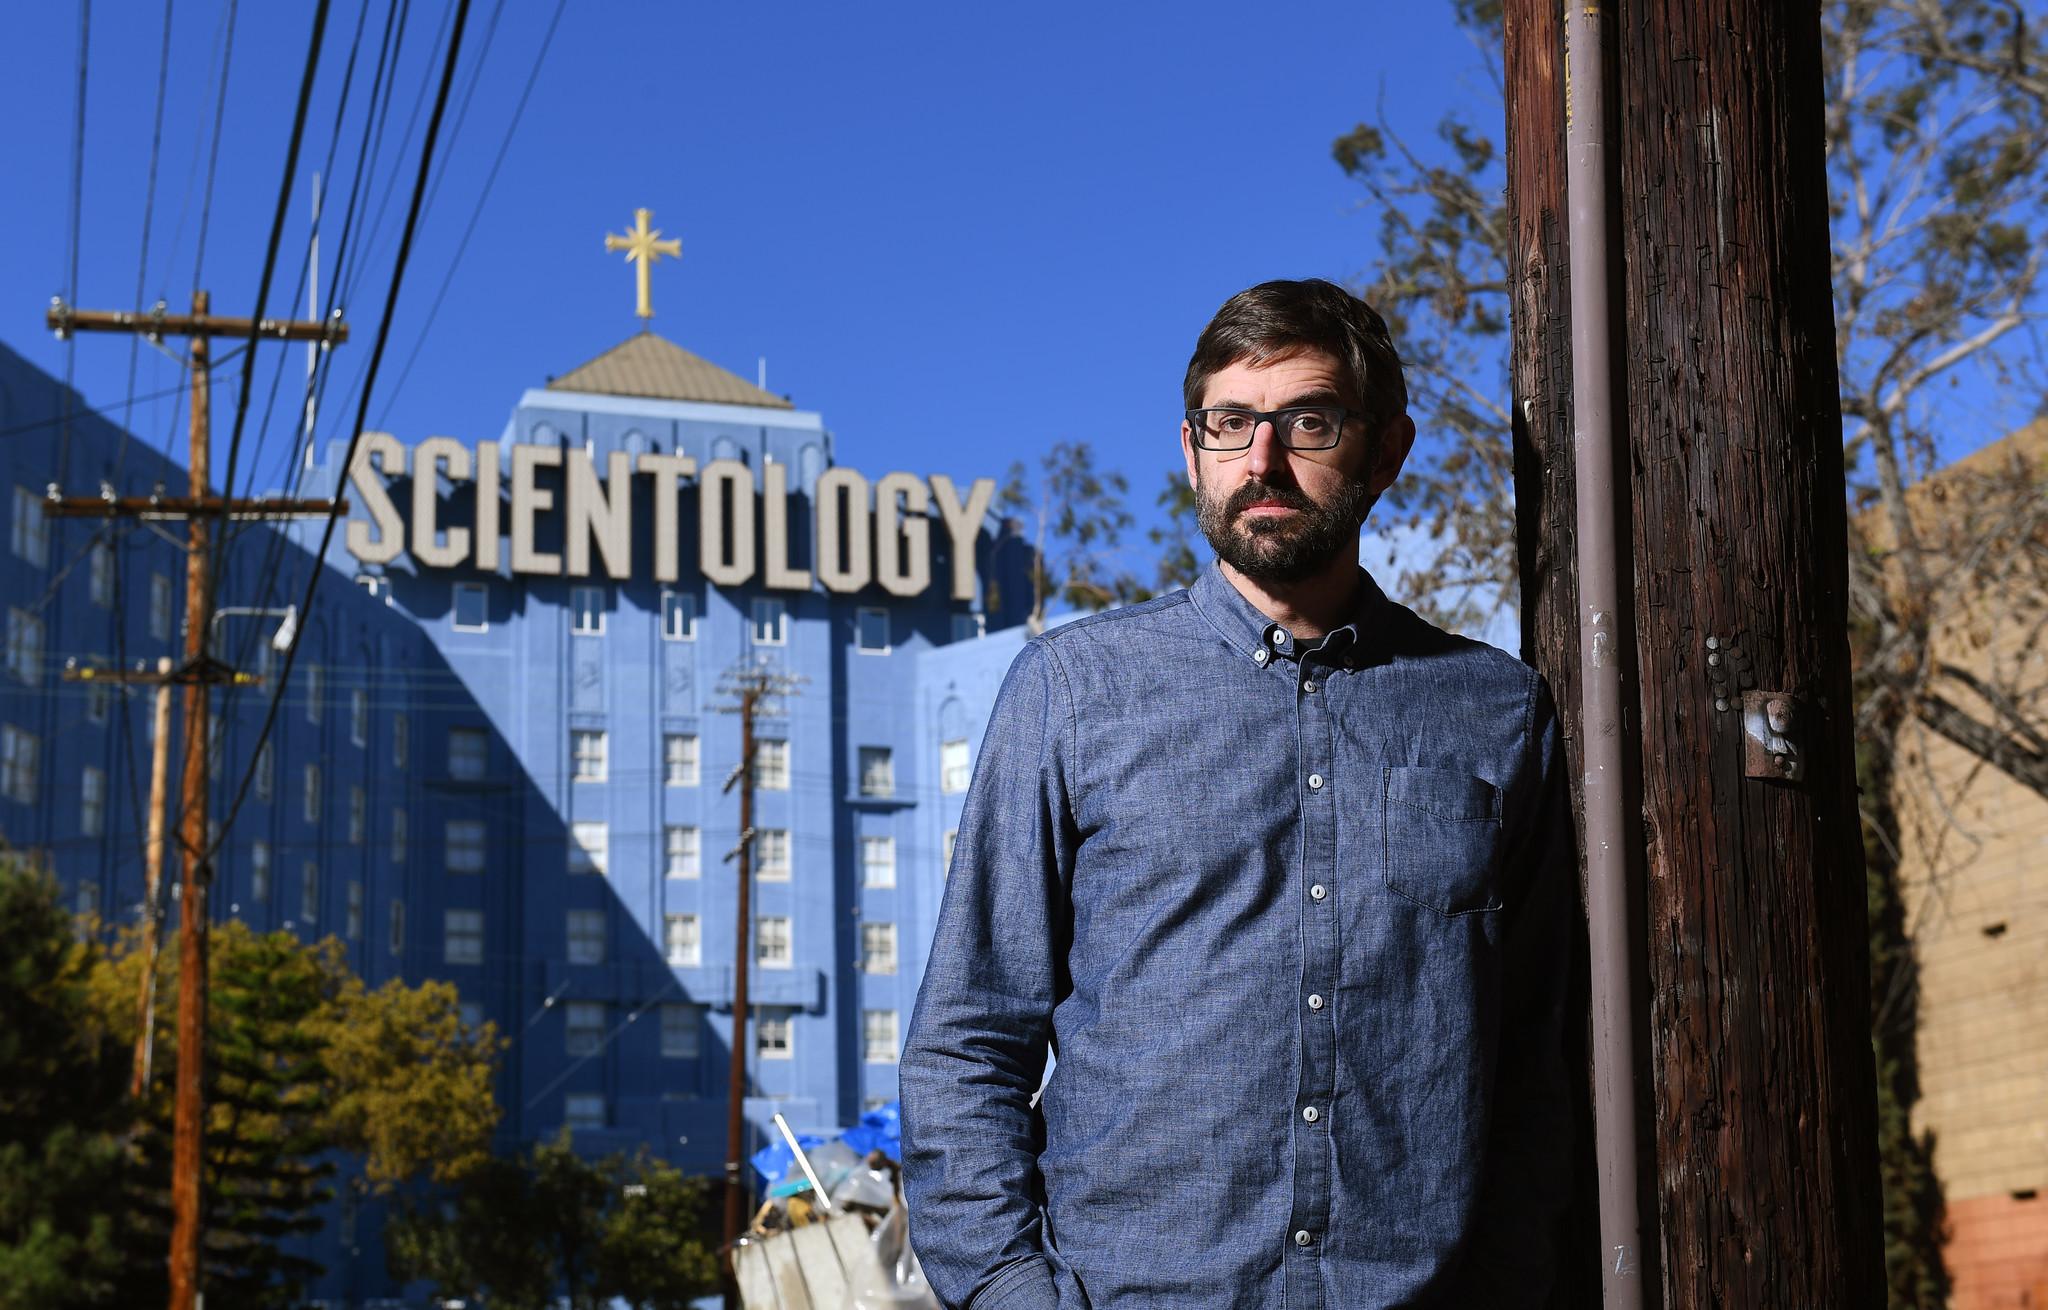 Scientology Film